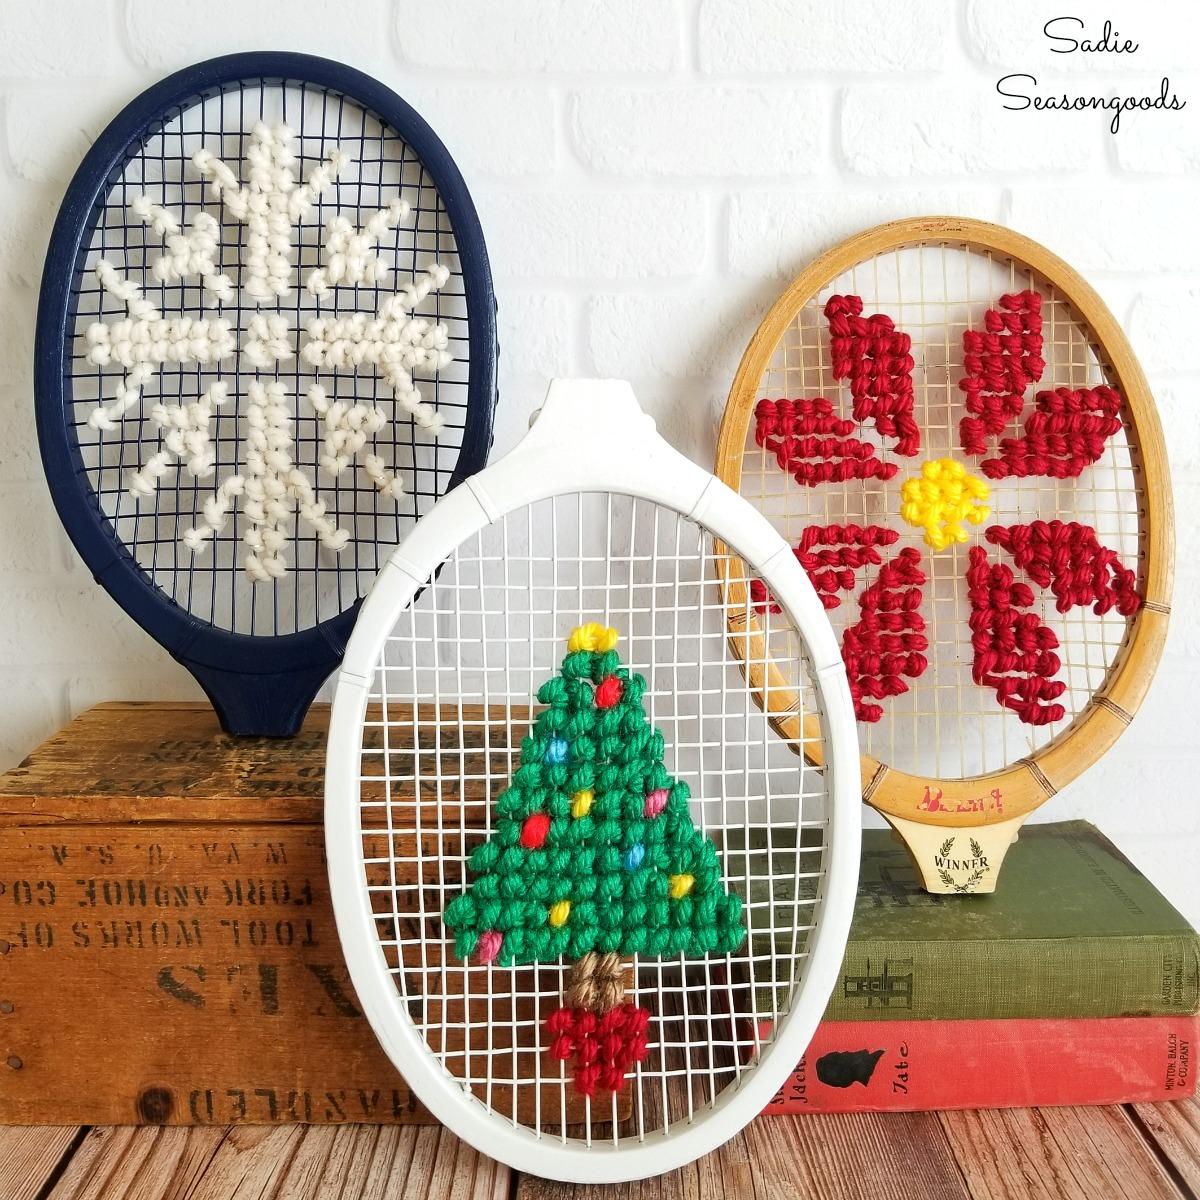 Christmas Cross Stitch on Vintage Tennis Rackets